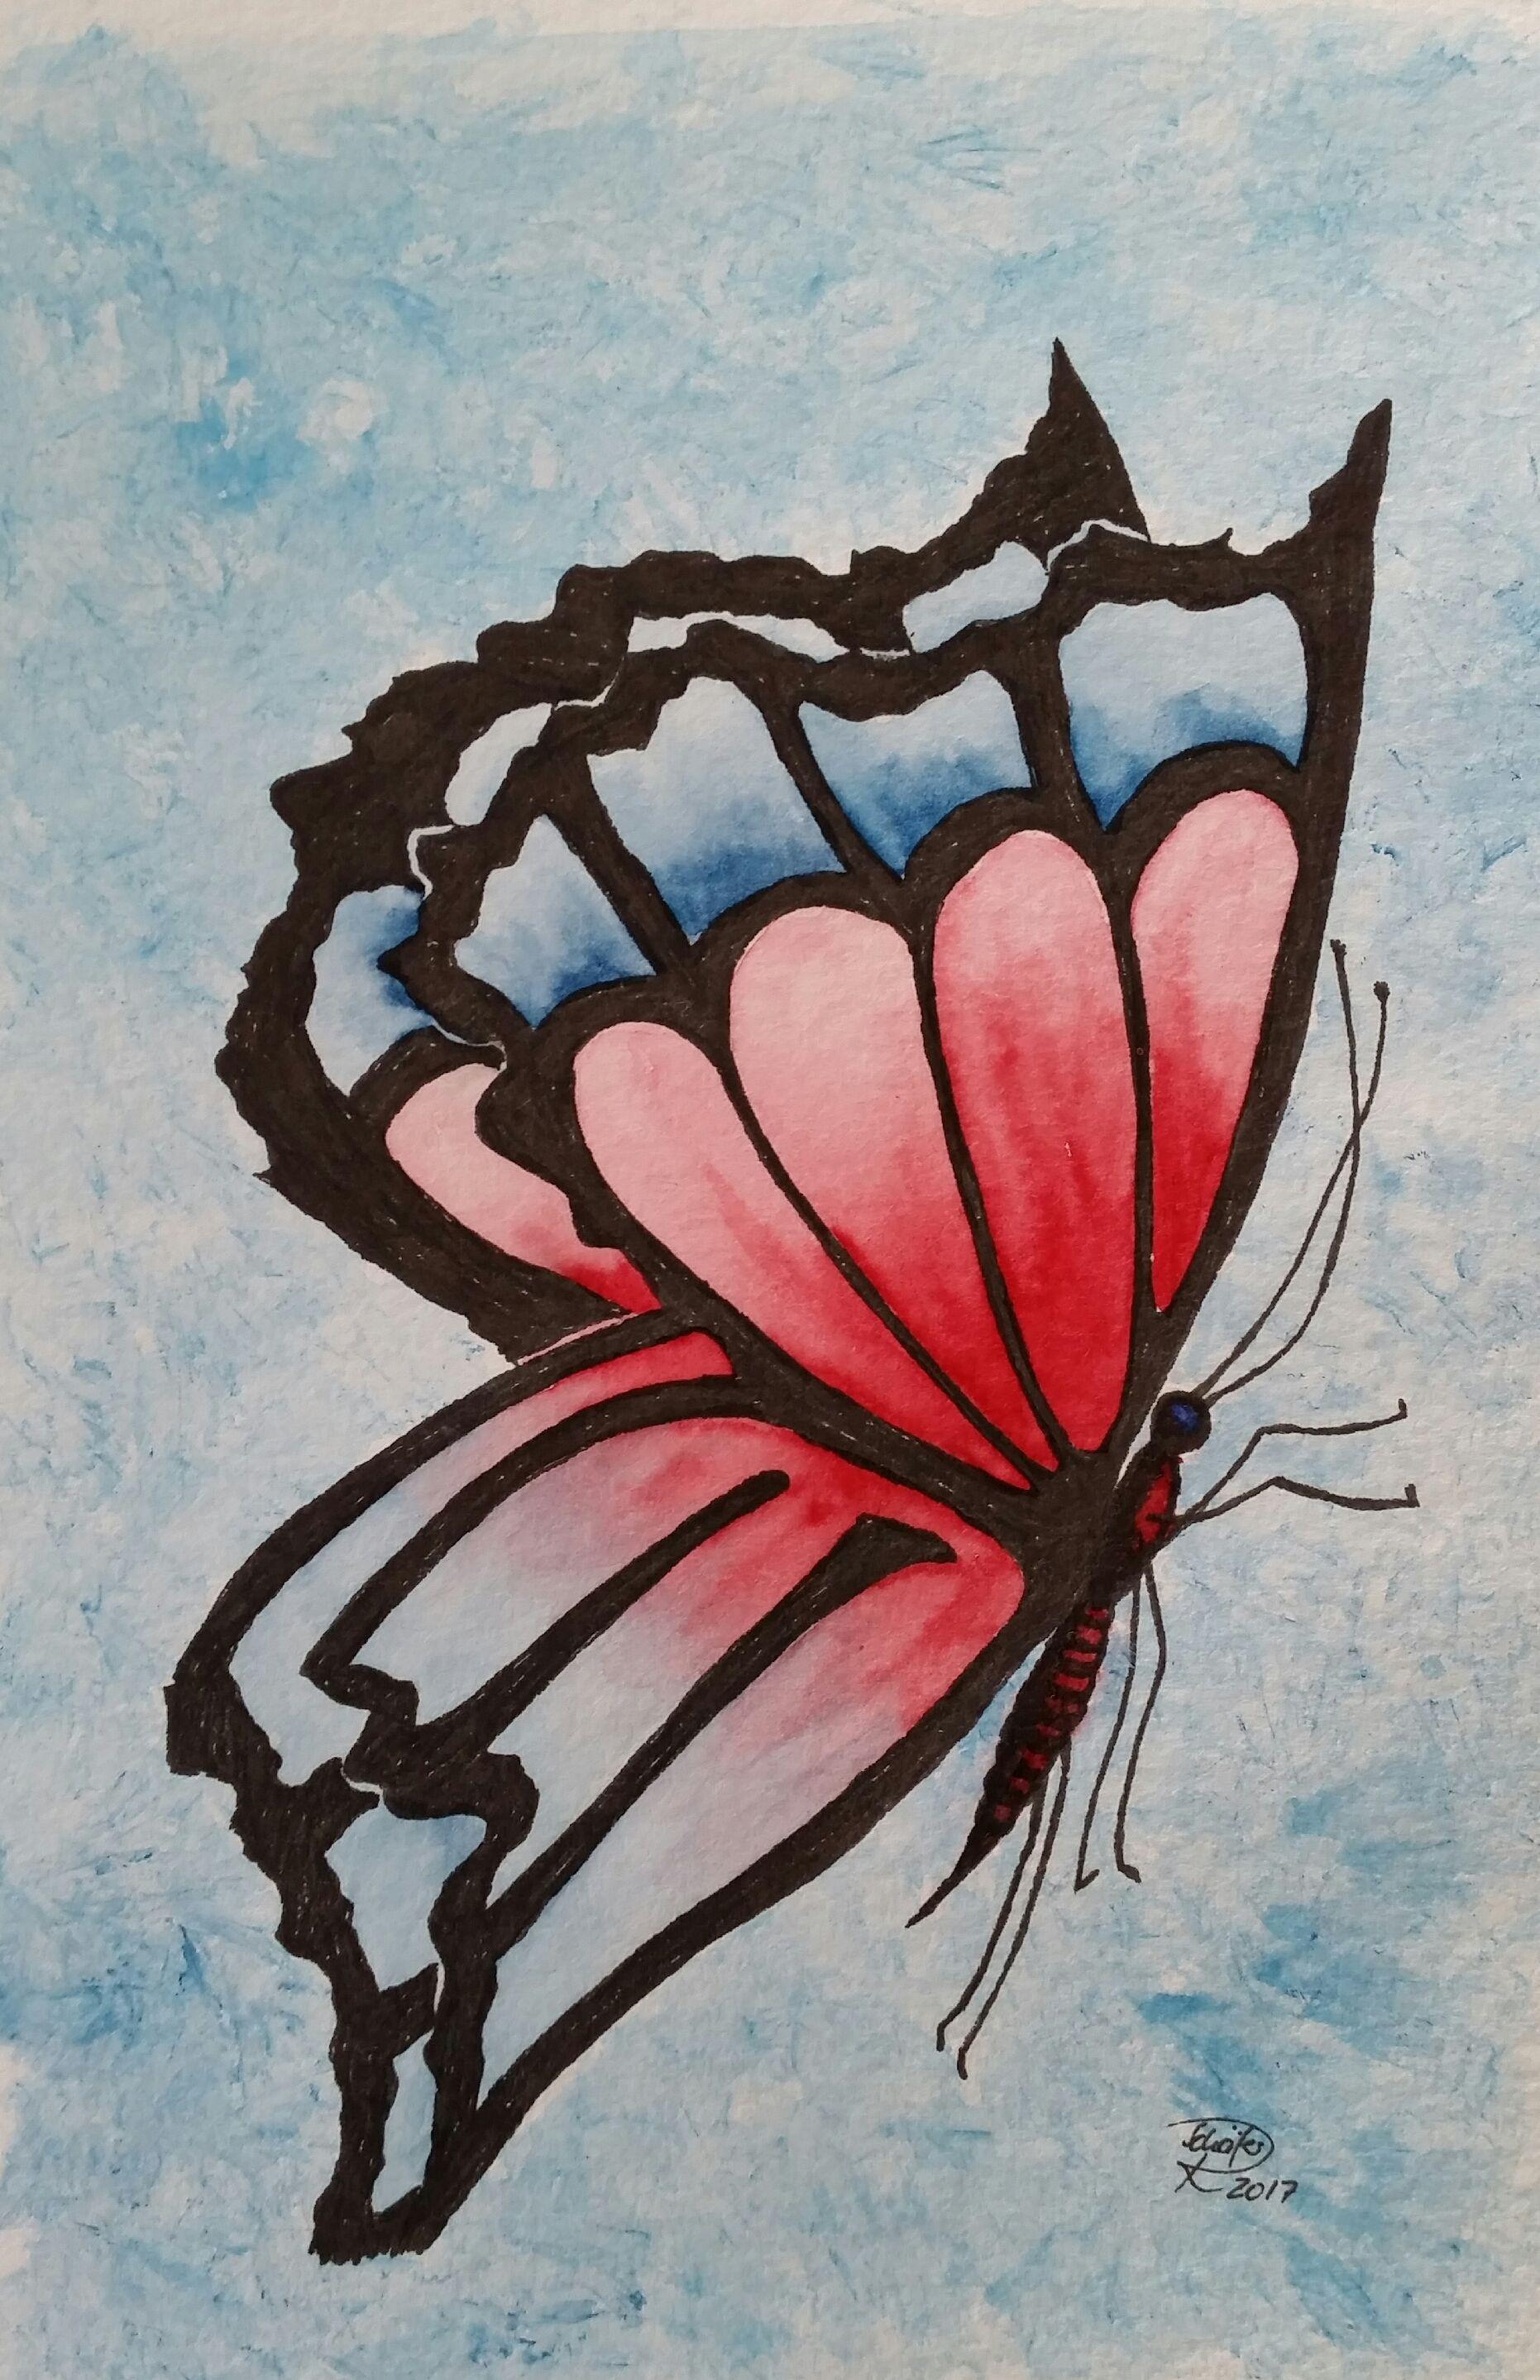 Pinterest Bilder Malen Einzigartig Aquarell Watercolor Schmetterling butterfly Fotografieren